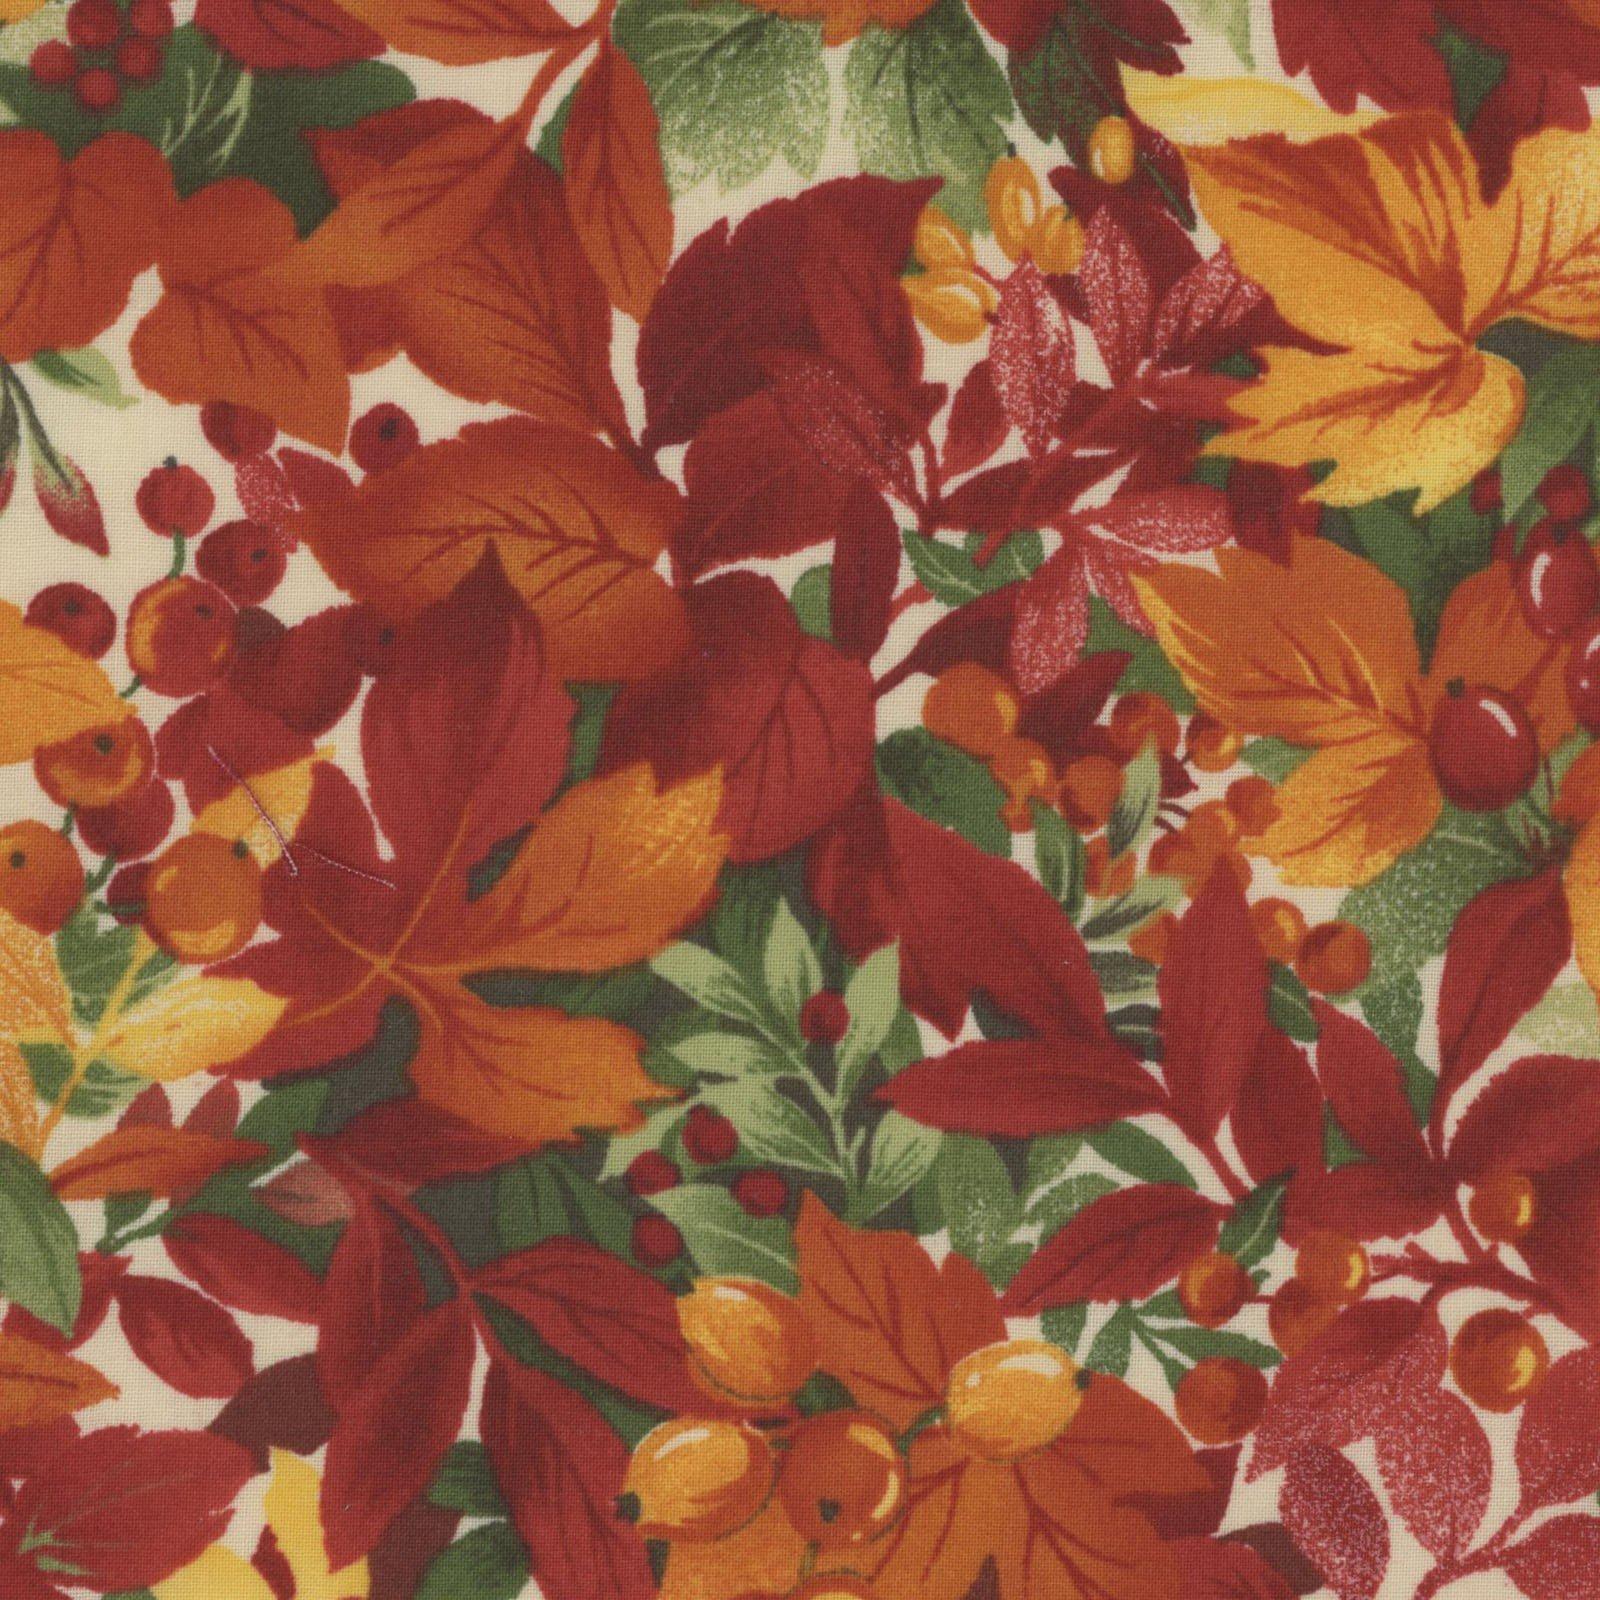 Maywood Studio  Falling Leaves